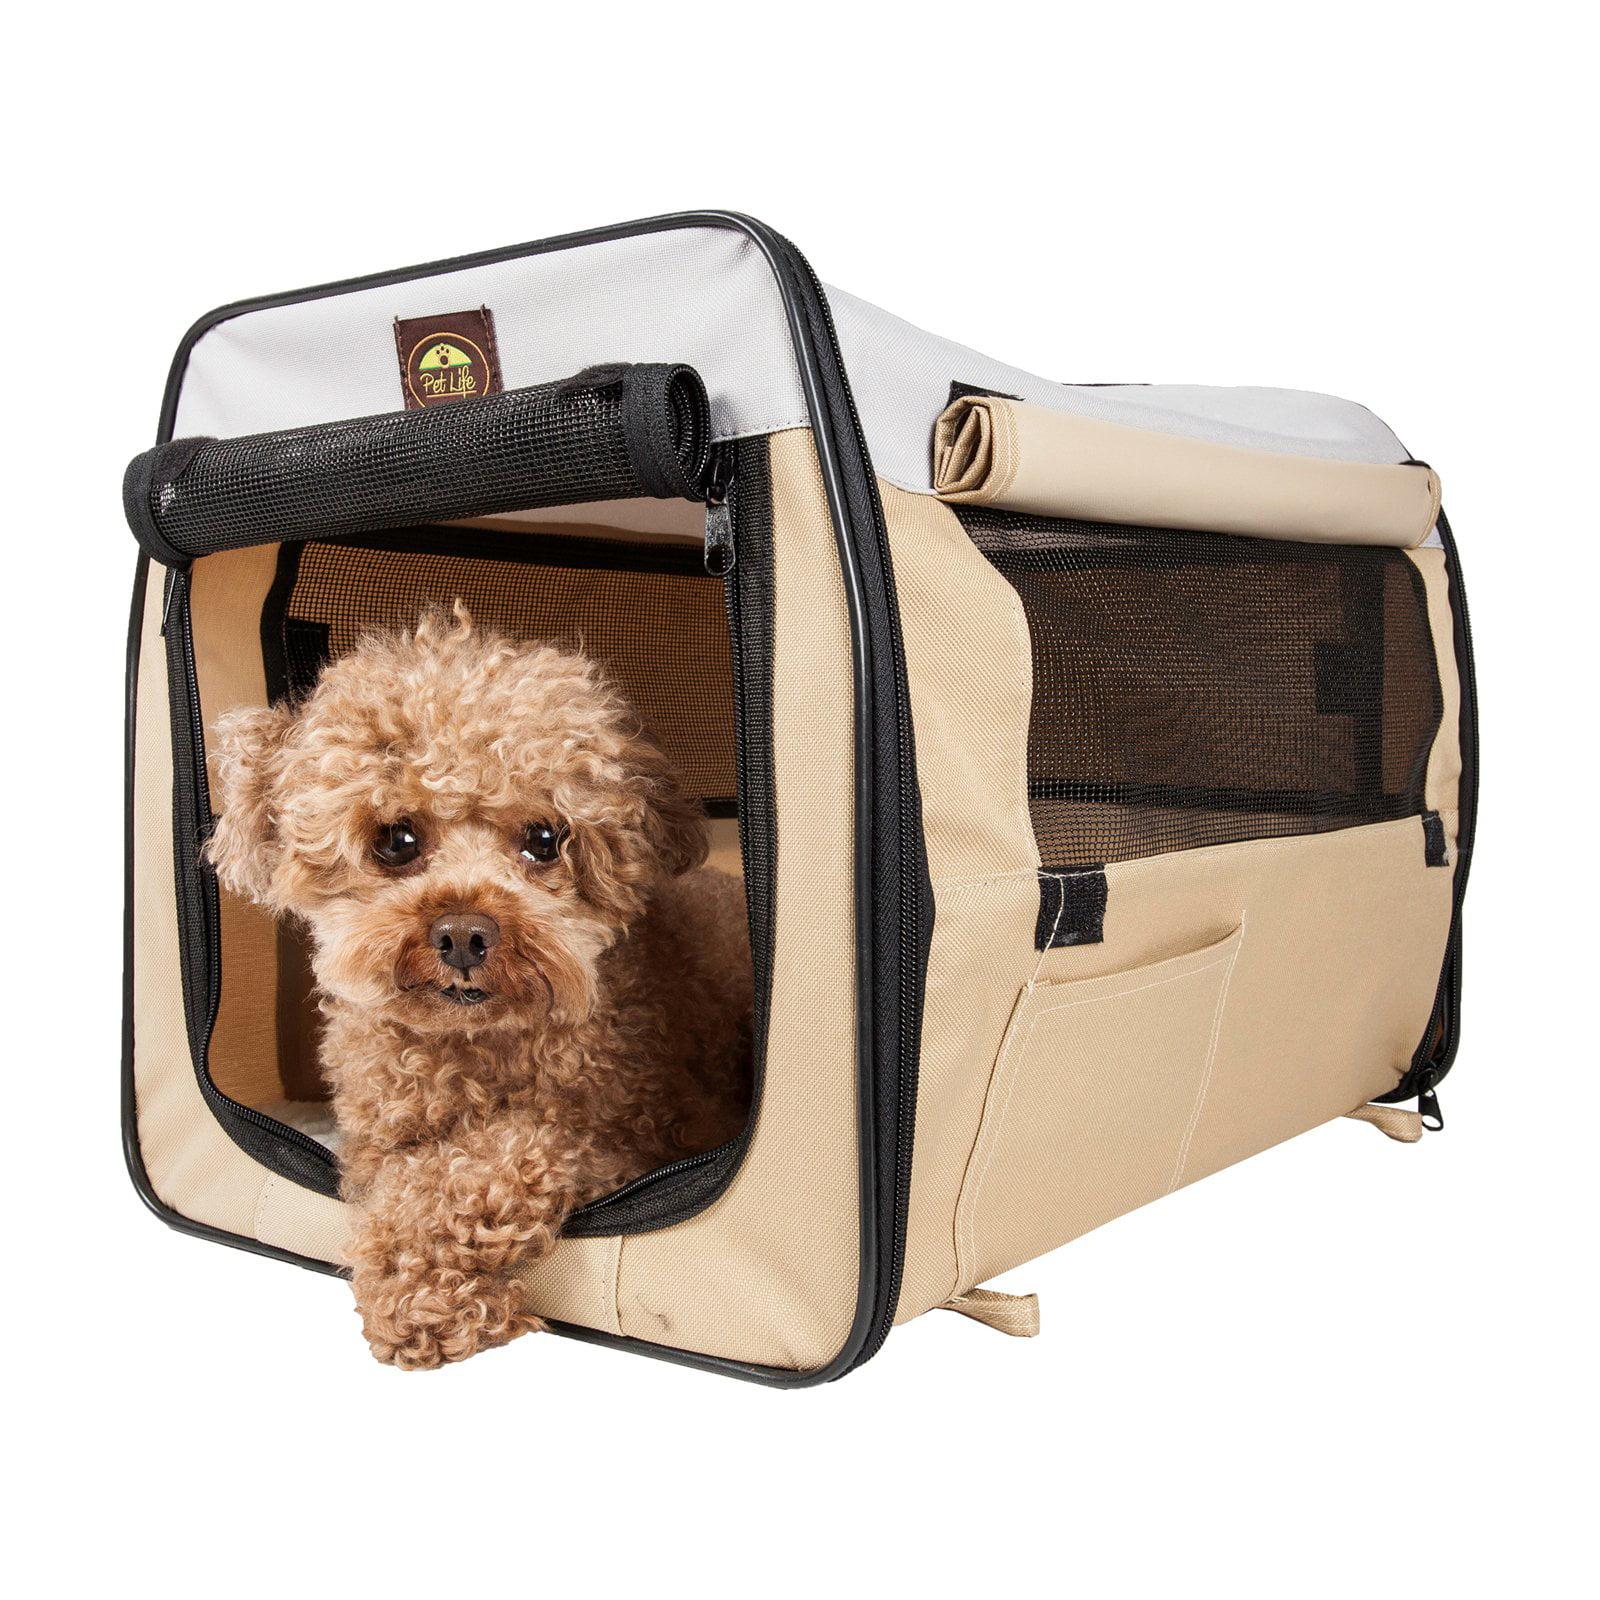 Pet Life Lightweight Folding Collapsible Zippered Easy Pet Crate - Khaki